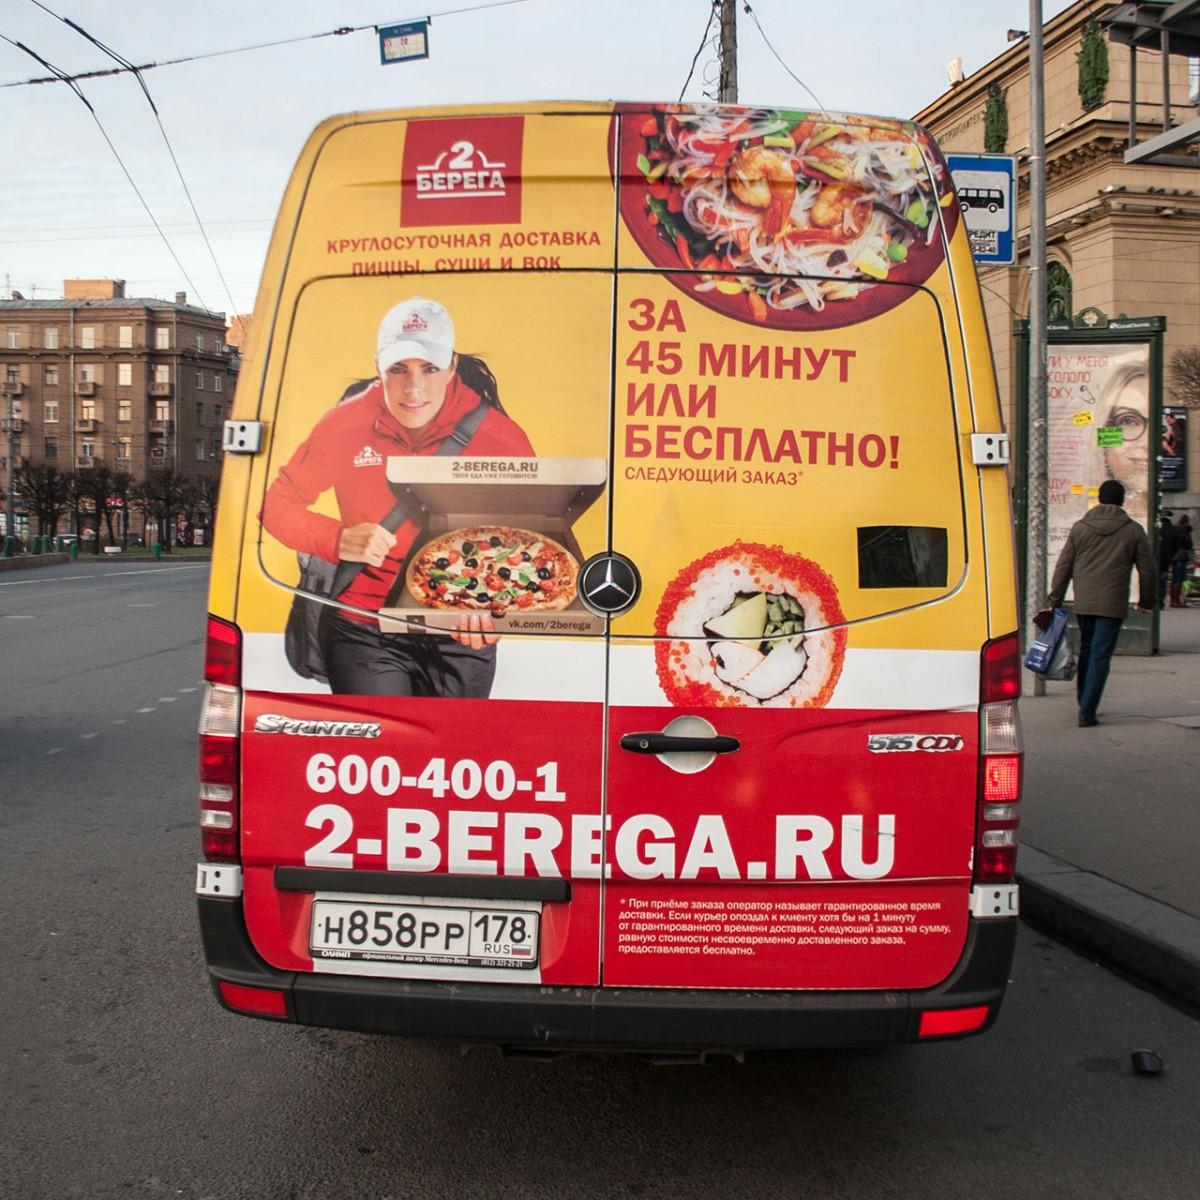 заказать рекламу на маршрутное такси